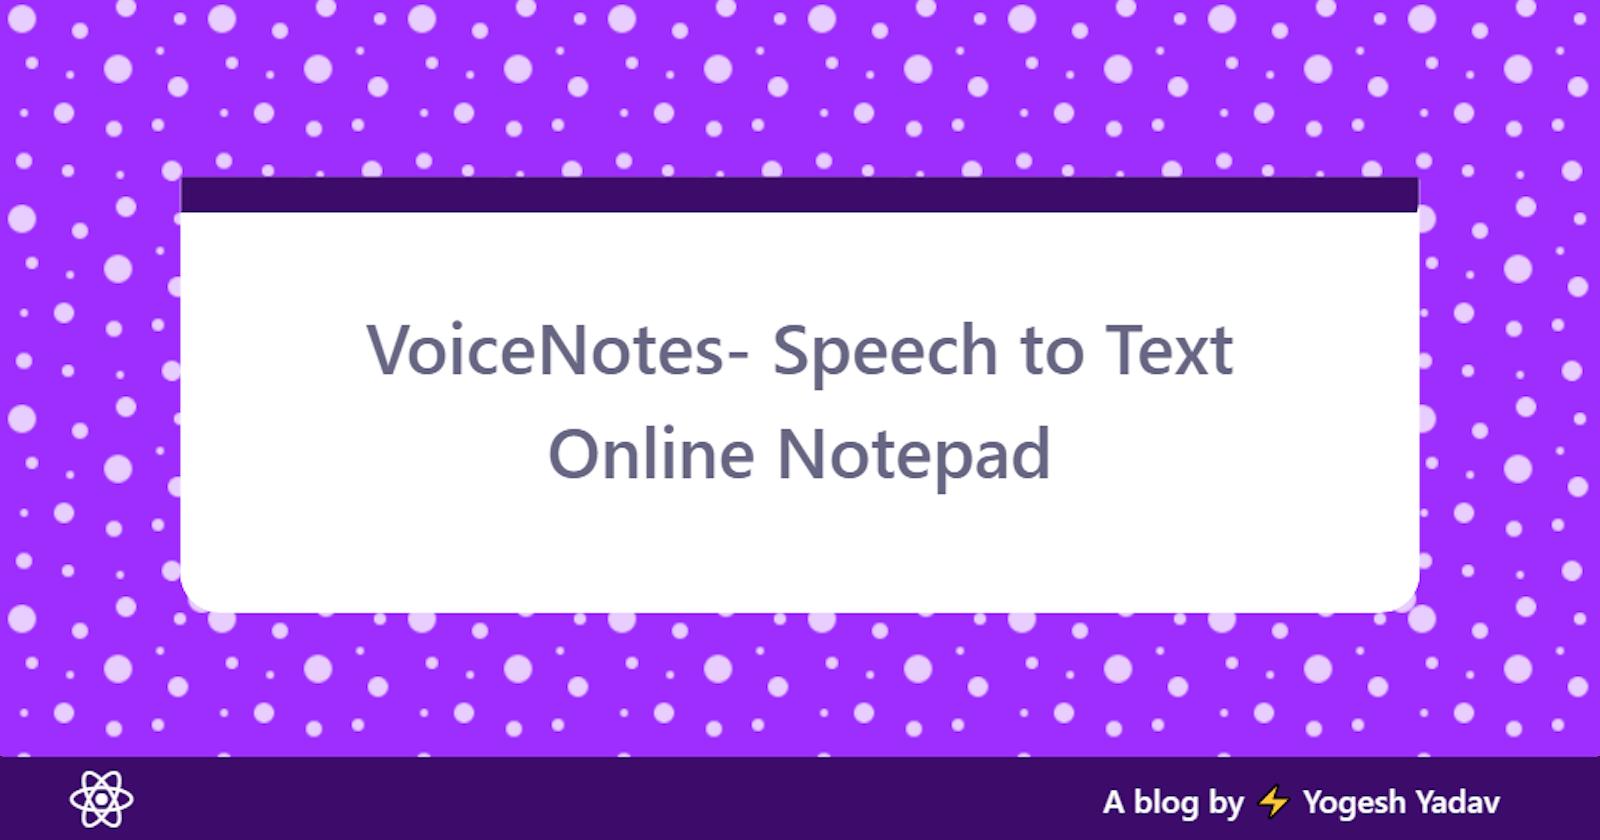 VoiceNotes- Speech to Text Online Notepad